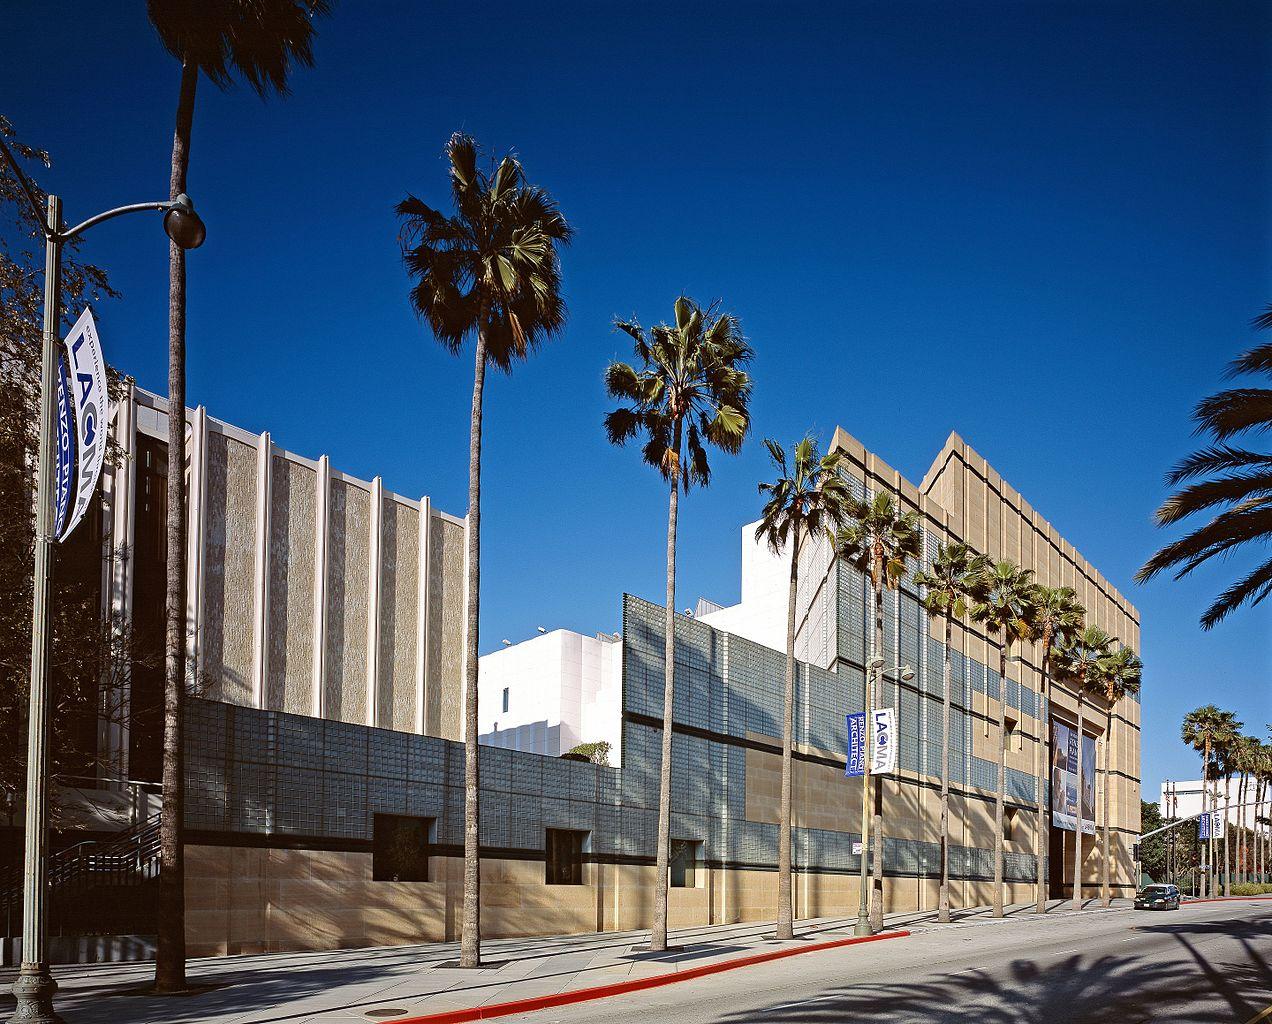 Top Popular Museum in Los Angeles-Los Angeles County Museum of Art